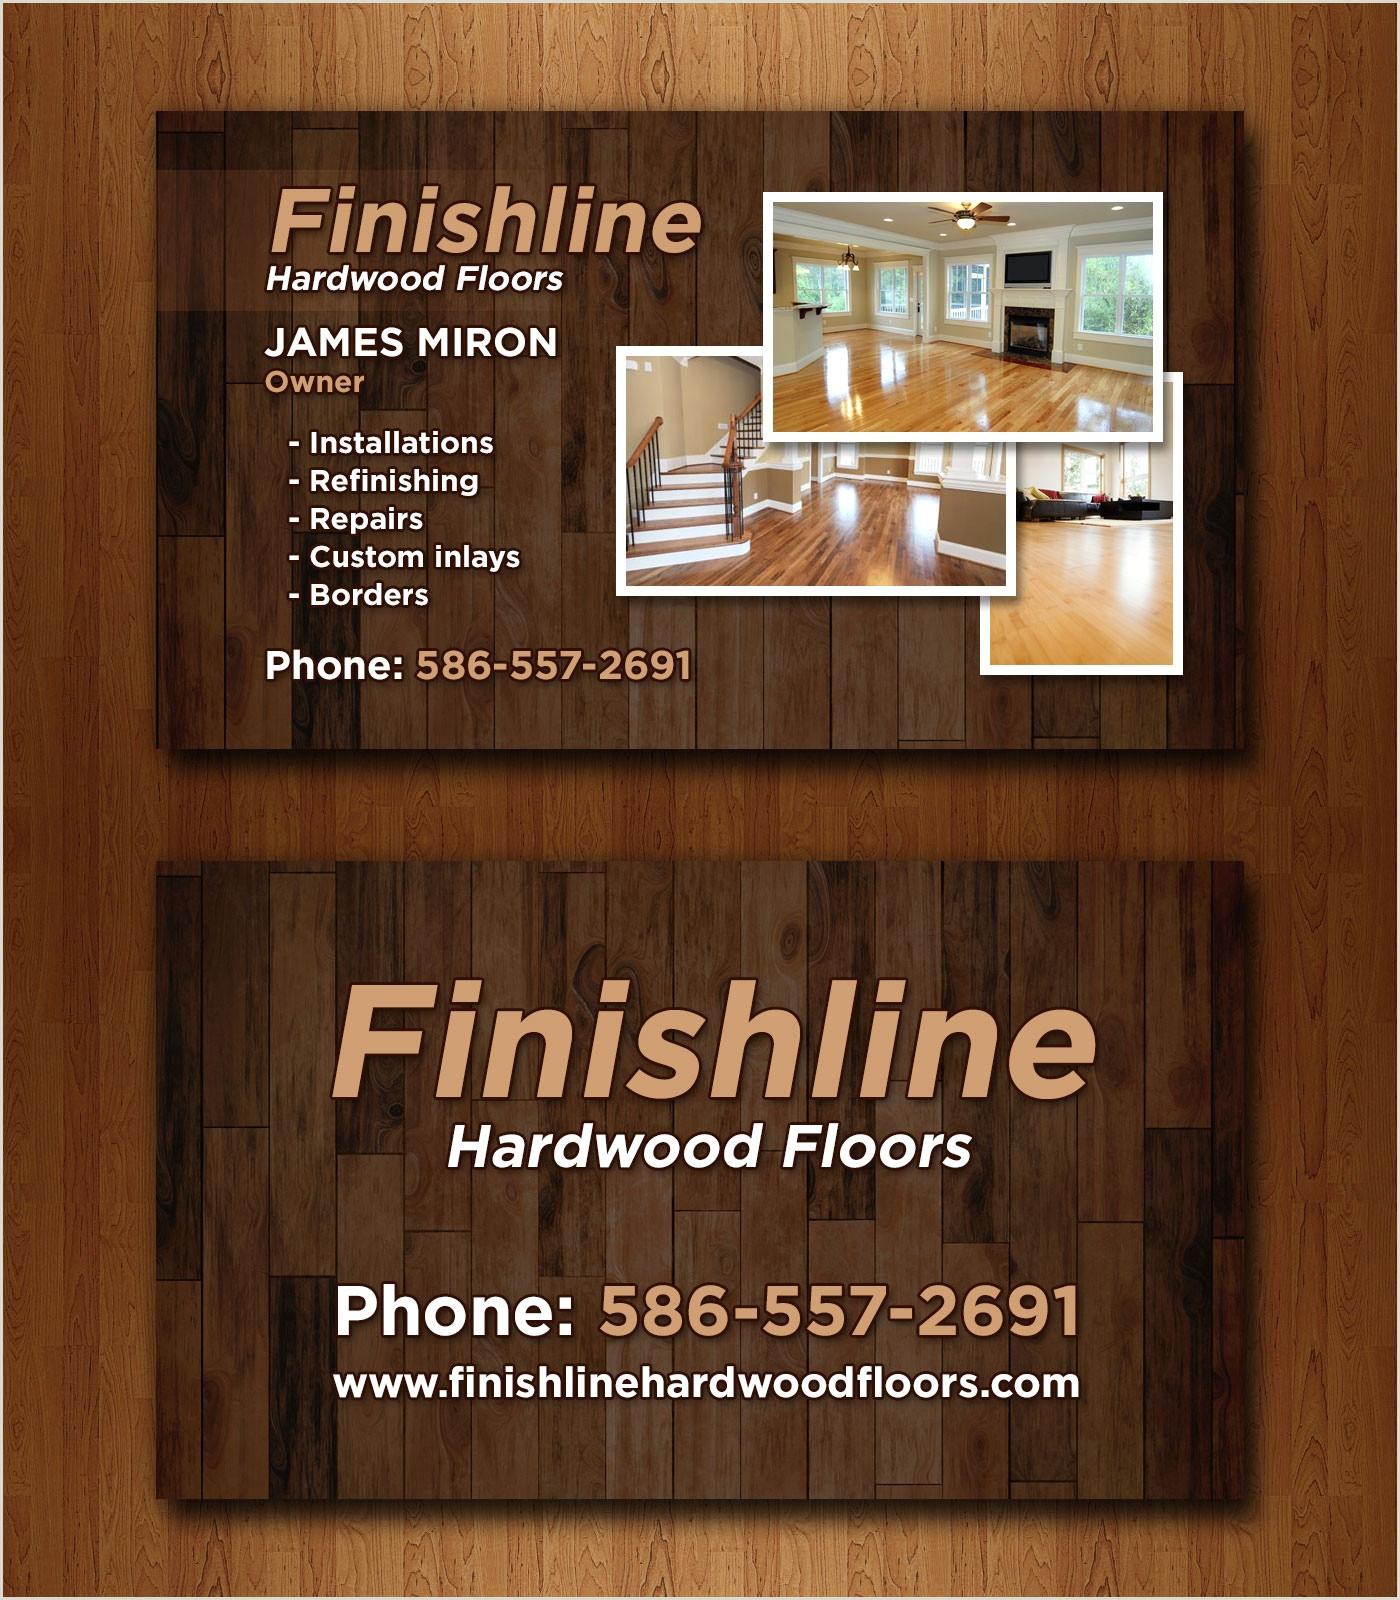 Business Card Layout Word 14 Popular Hardwood Flooring Business Card Template